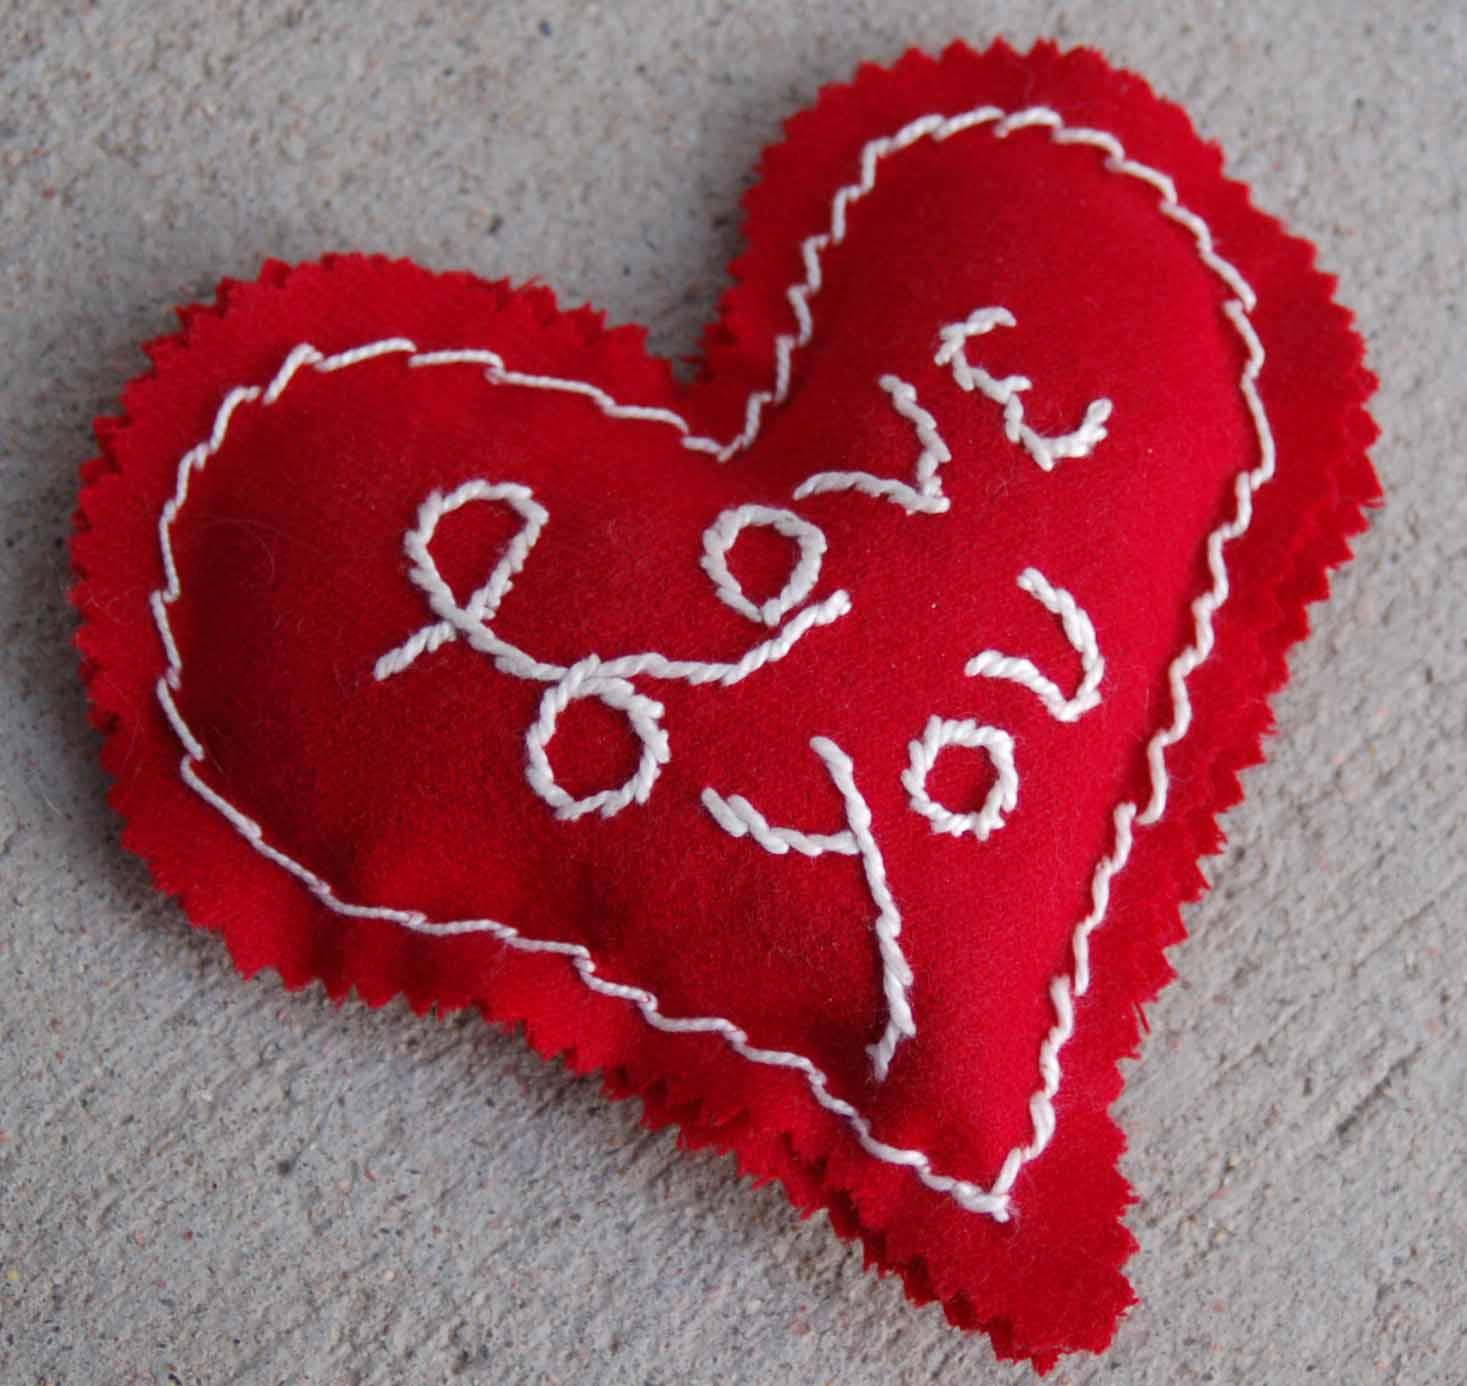 http://4.bp.blogspot.com/-4kkr9r98j2A/URyJCTExtII/AAAAAAAABGk/_5QOaPAv4gA/s1600/Valentine2013.jpg